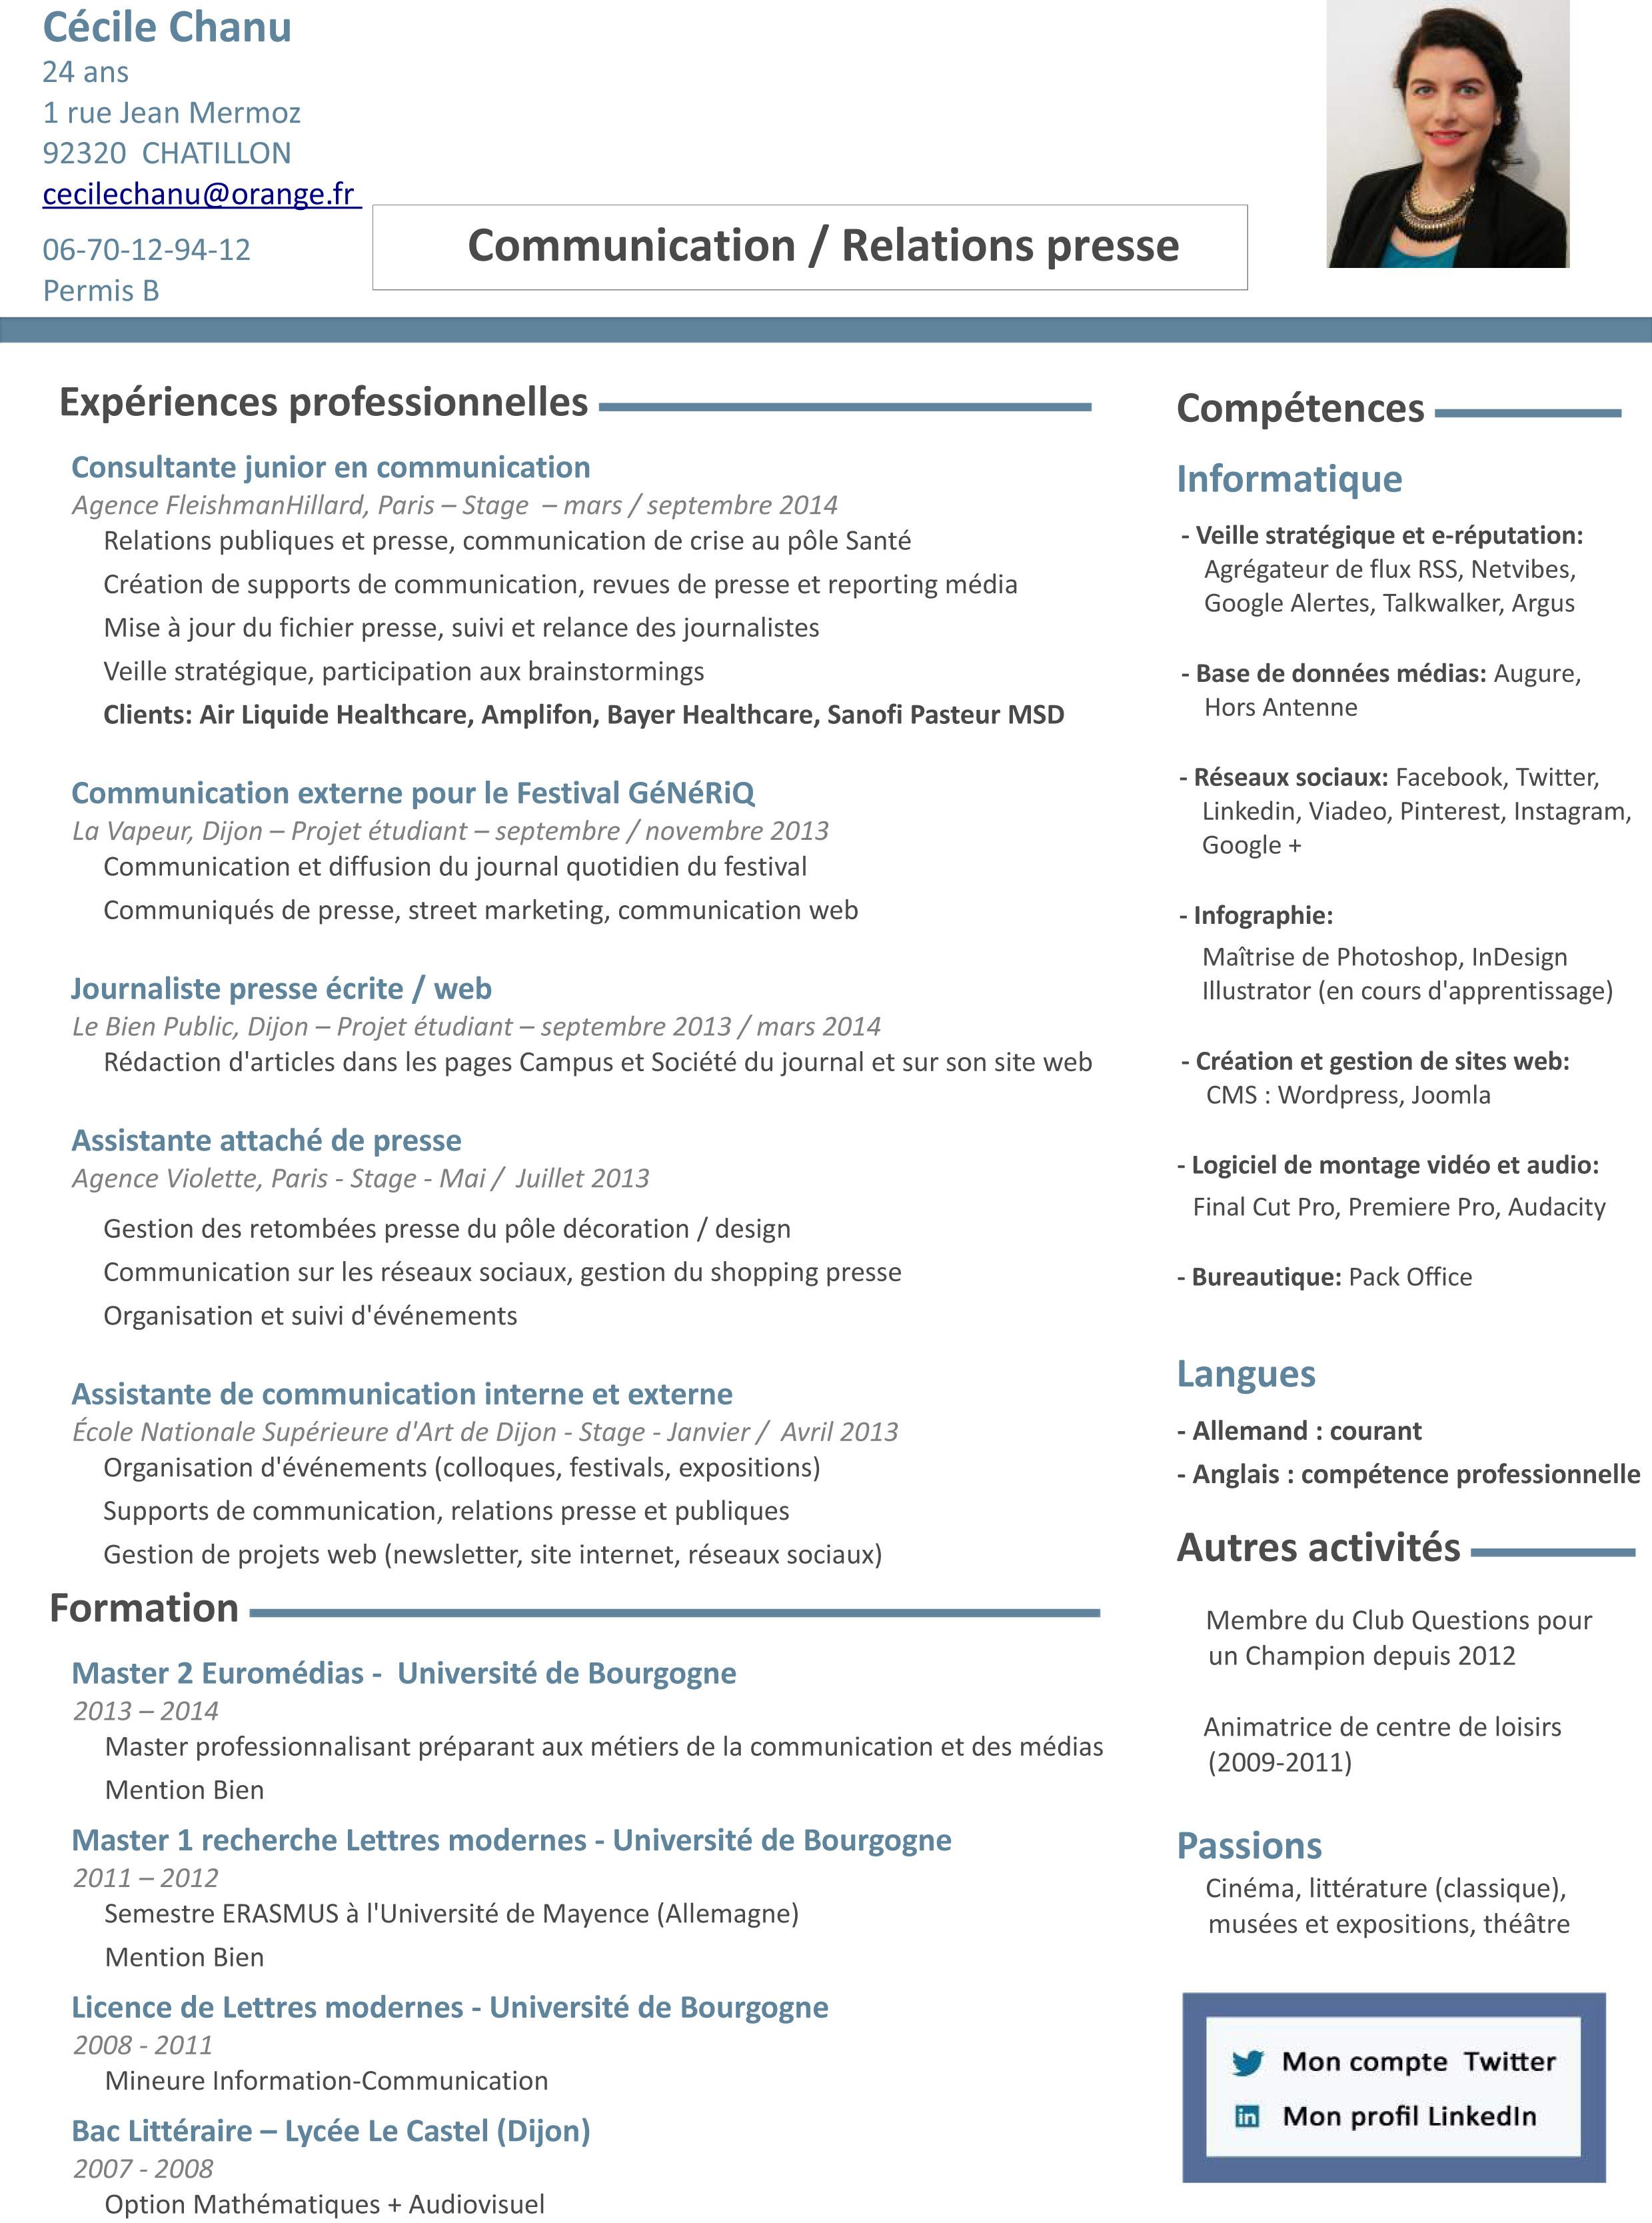 candidat communication herault cv en ligne